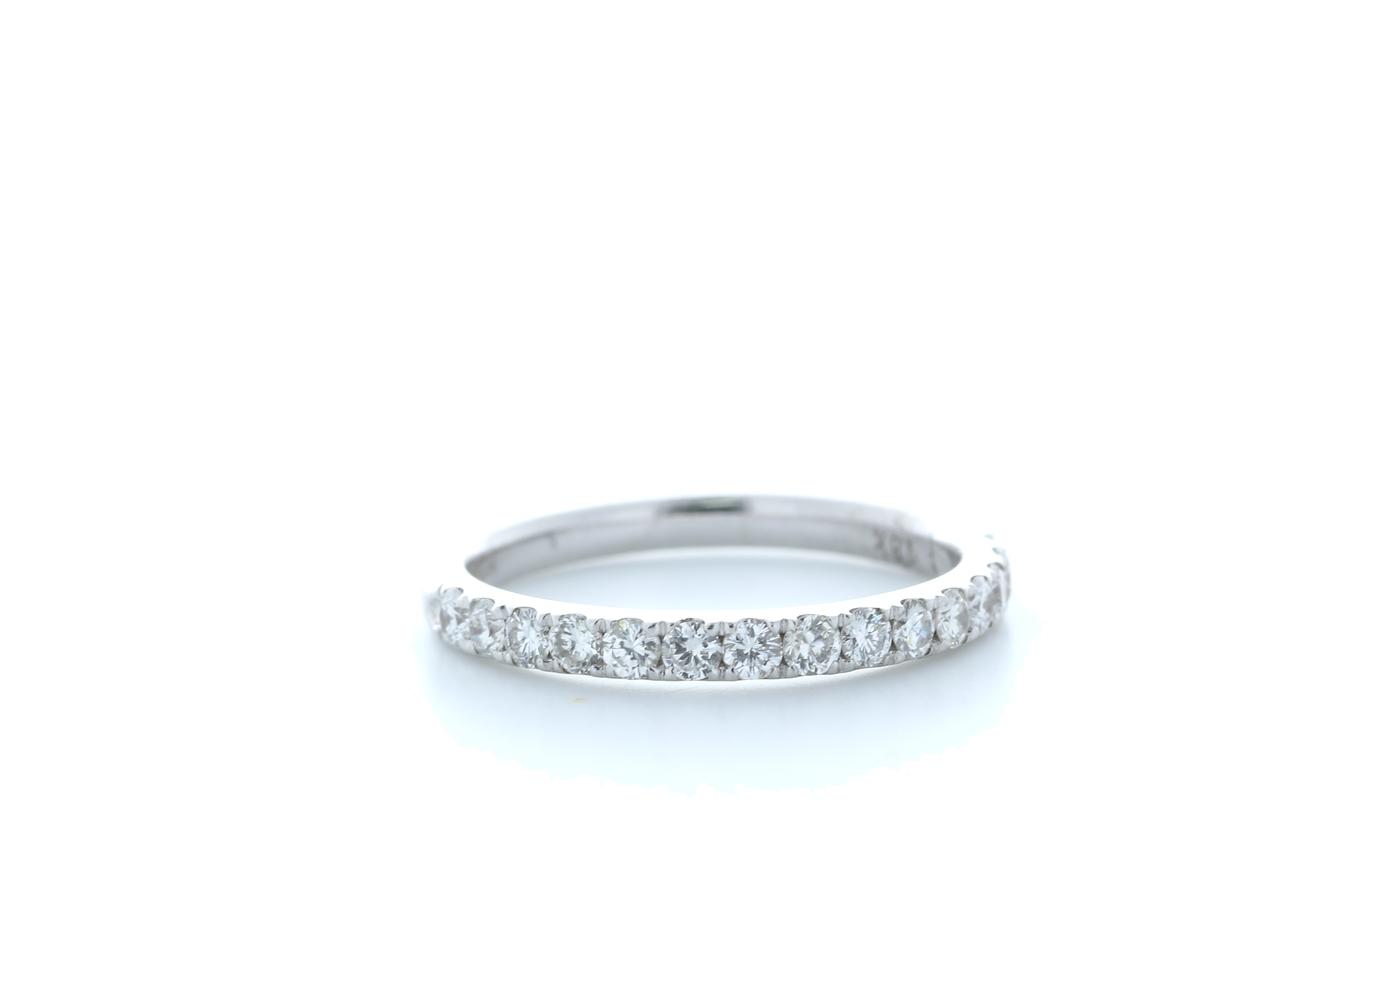 18ct White Gold Claw Set Semi Eternity Diamond Ring 0.17 Carats